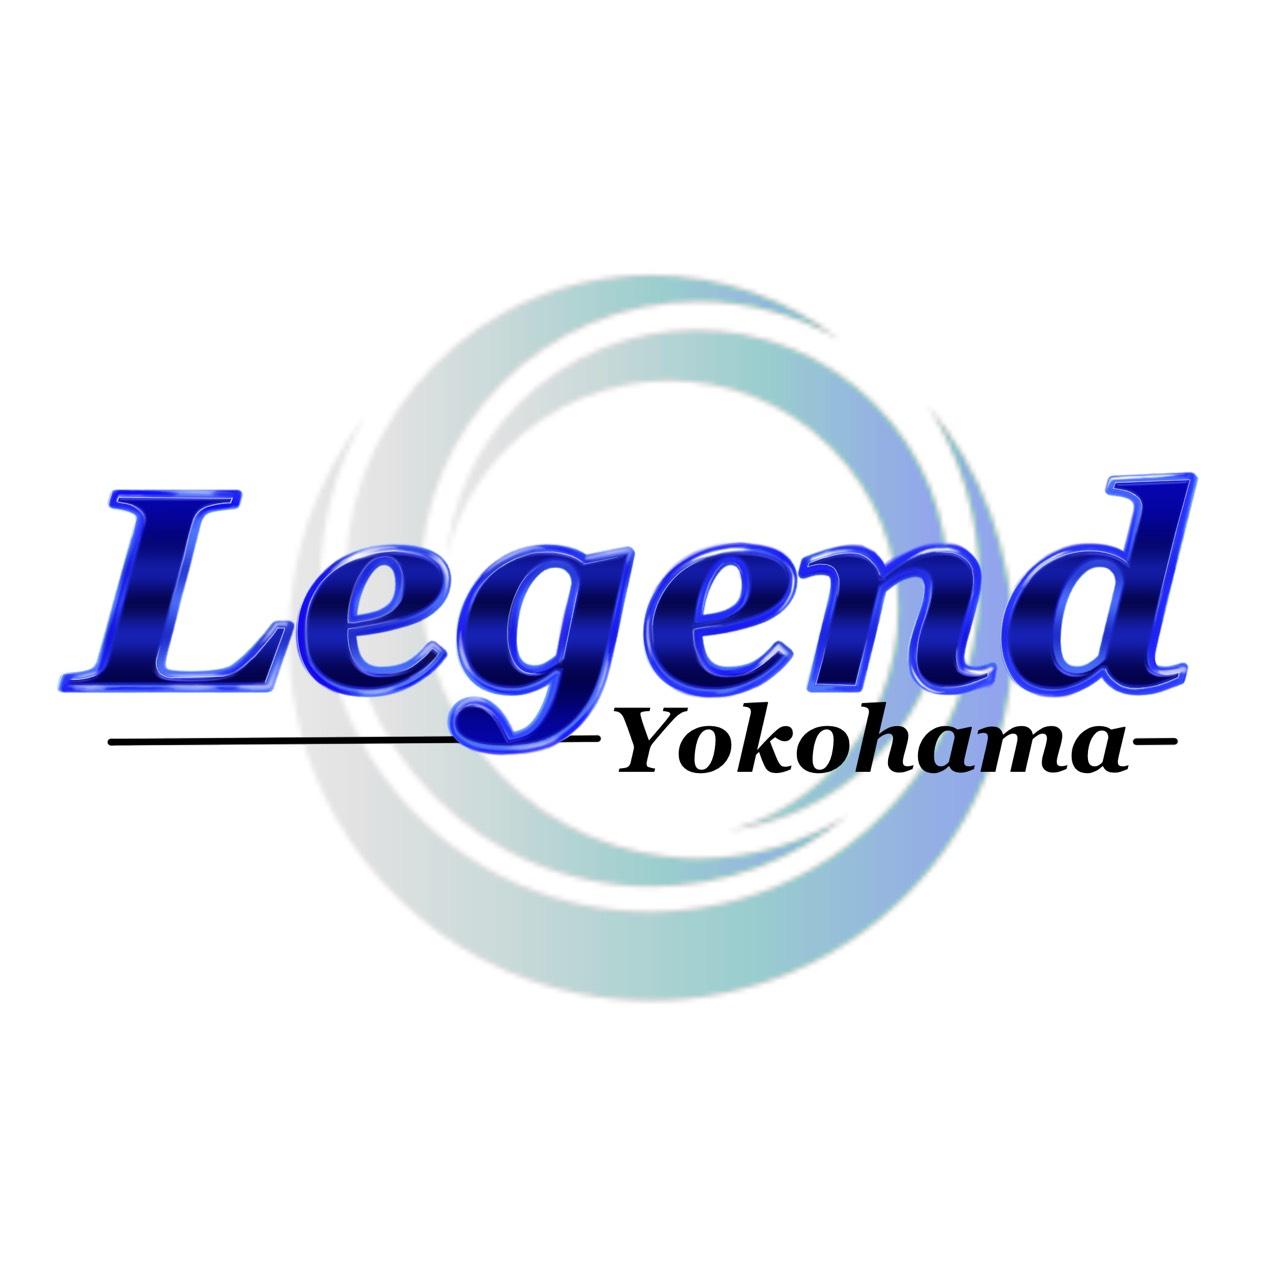 Legend Yokohama